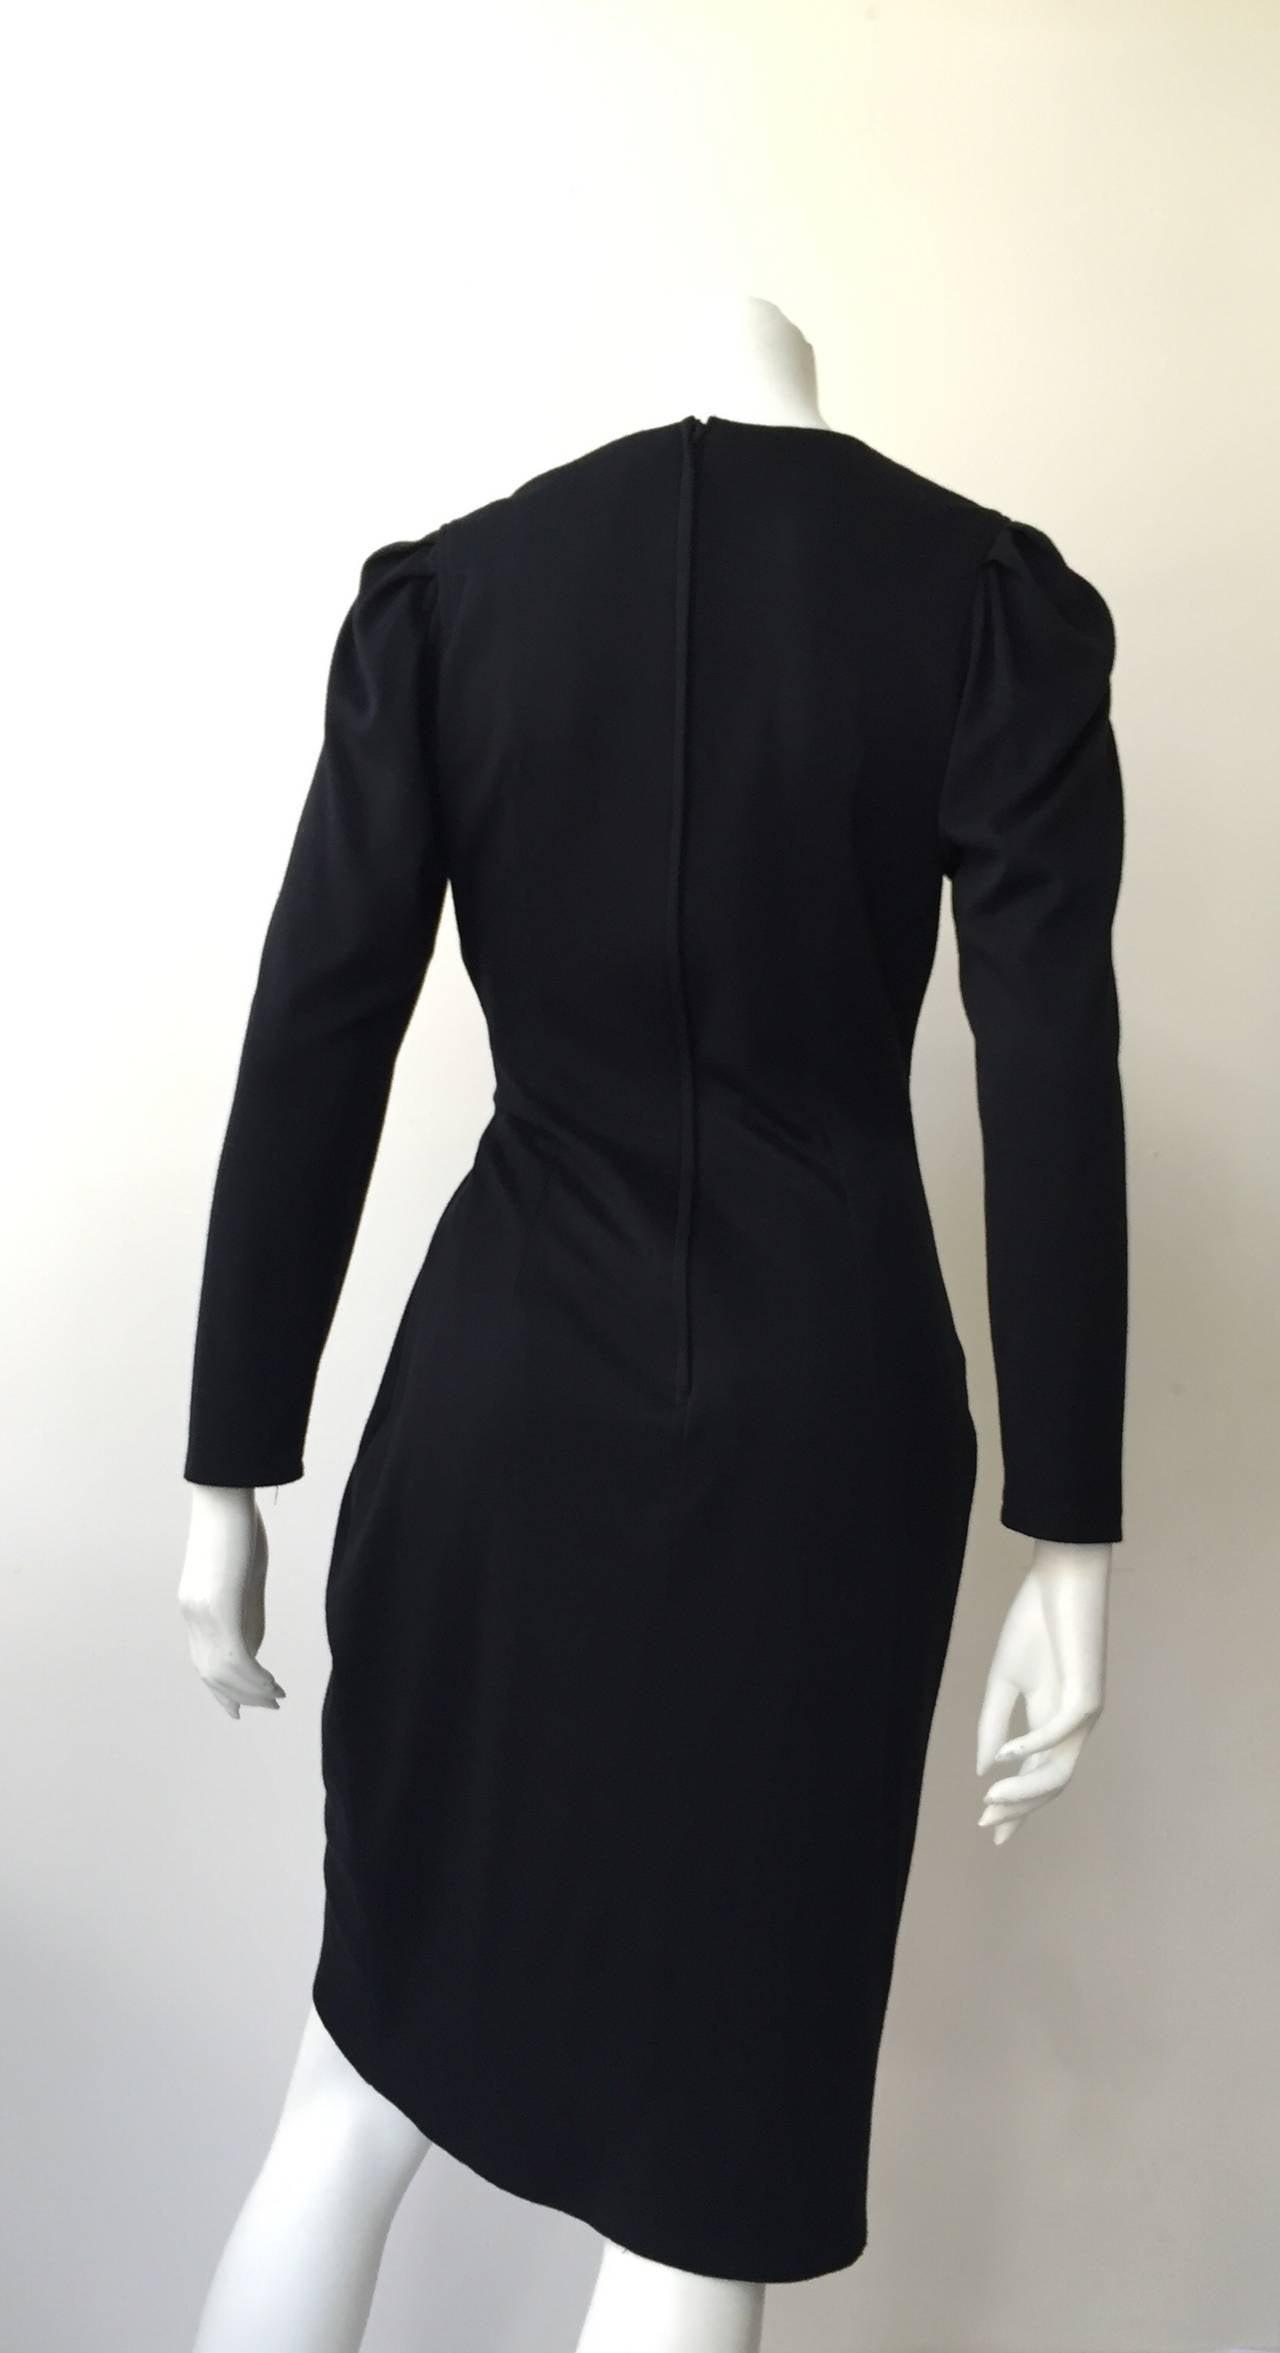 Zandra Rhodes 1980s Black with Sequin Dress Size 6. 8